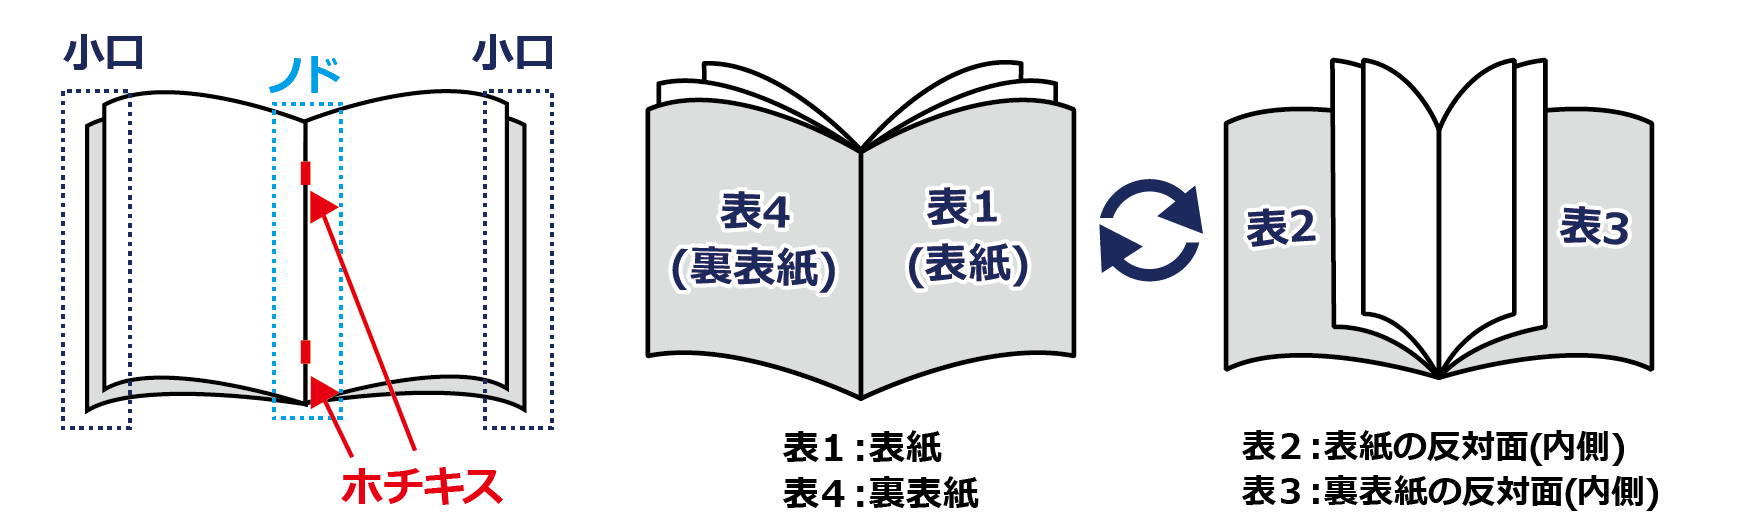 pdf 印刷 製本用 余白